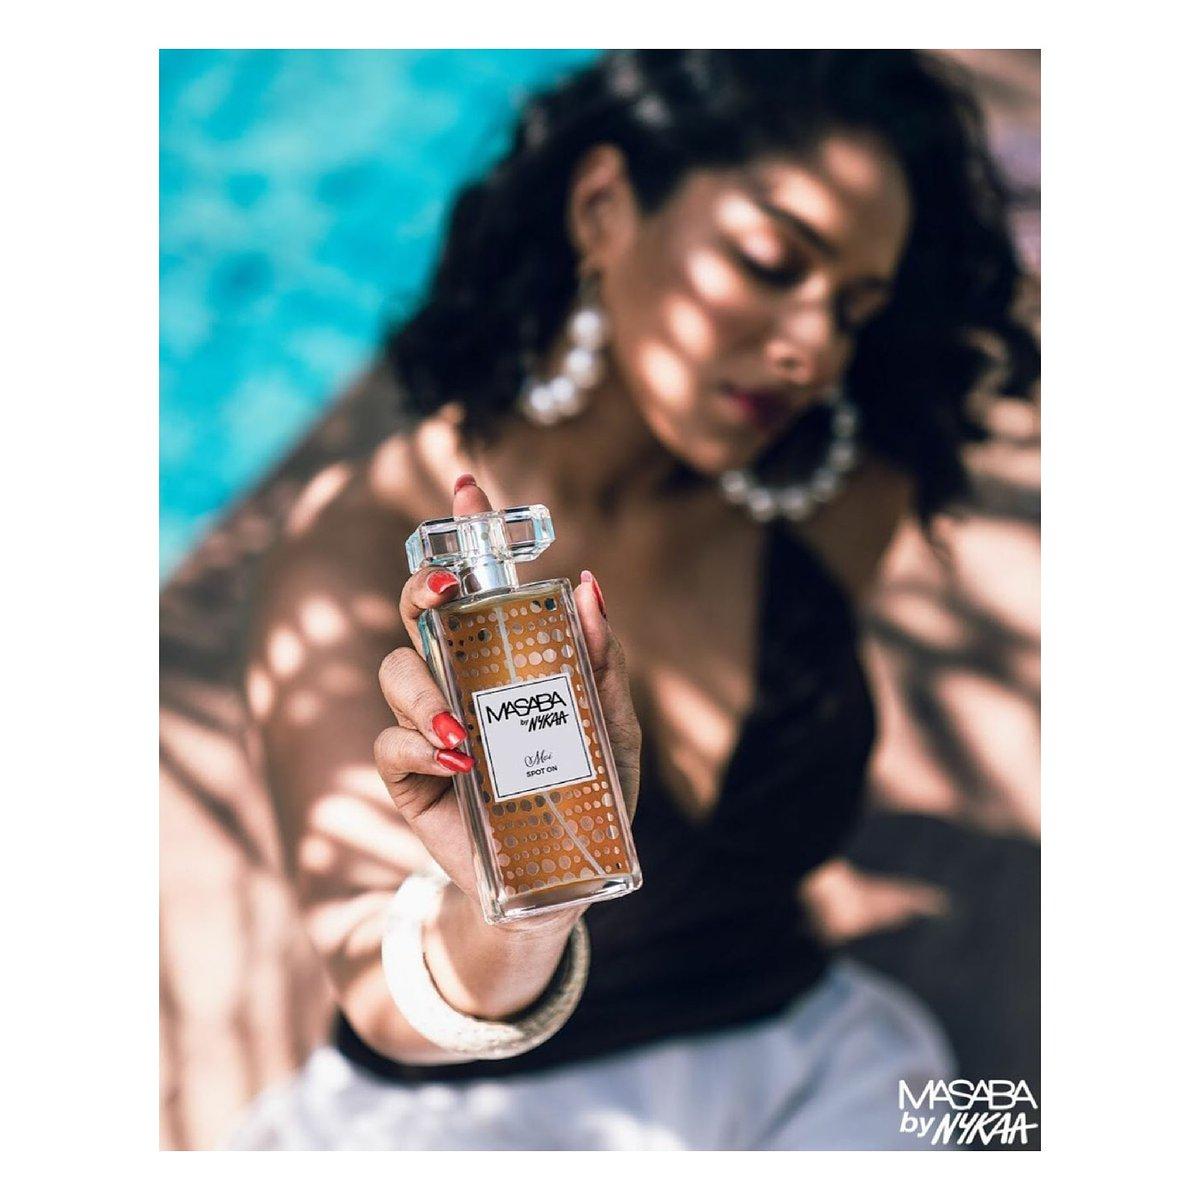 An unforgettable scent 💫 In frame - #MasabaForMoiByNykaa Spot On. Available in 6 variants priced at ₹1800.   #ElevateYourSpirit #MasabaByNykaa #NewLaunch #NykaaFragrances #Masaba @houseofmasaba @MyNykaa https://t.co/mD5D7q05HU